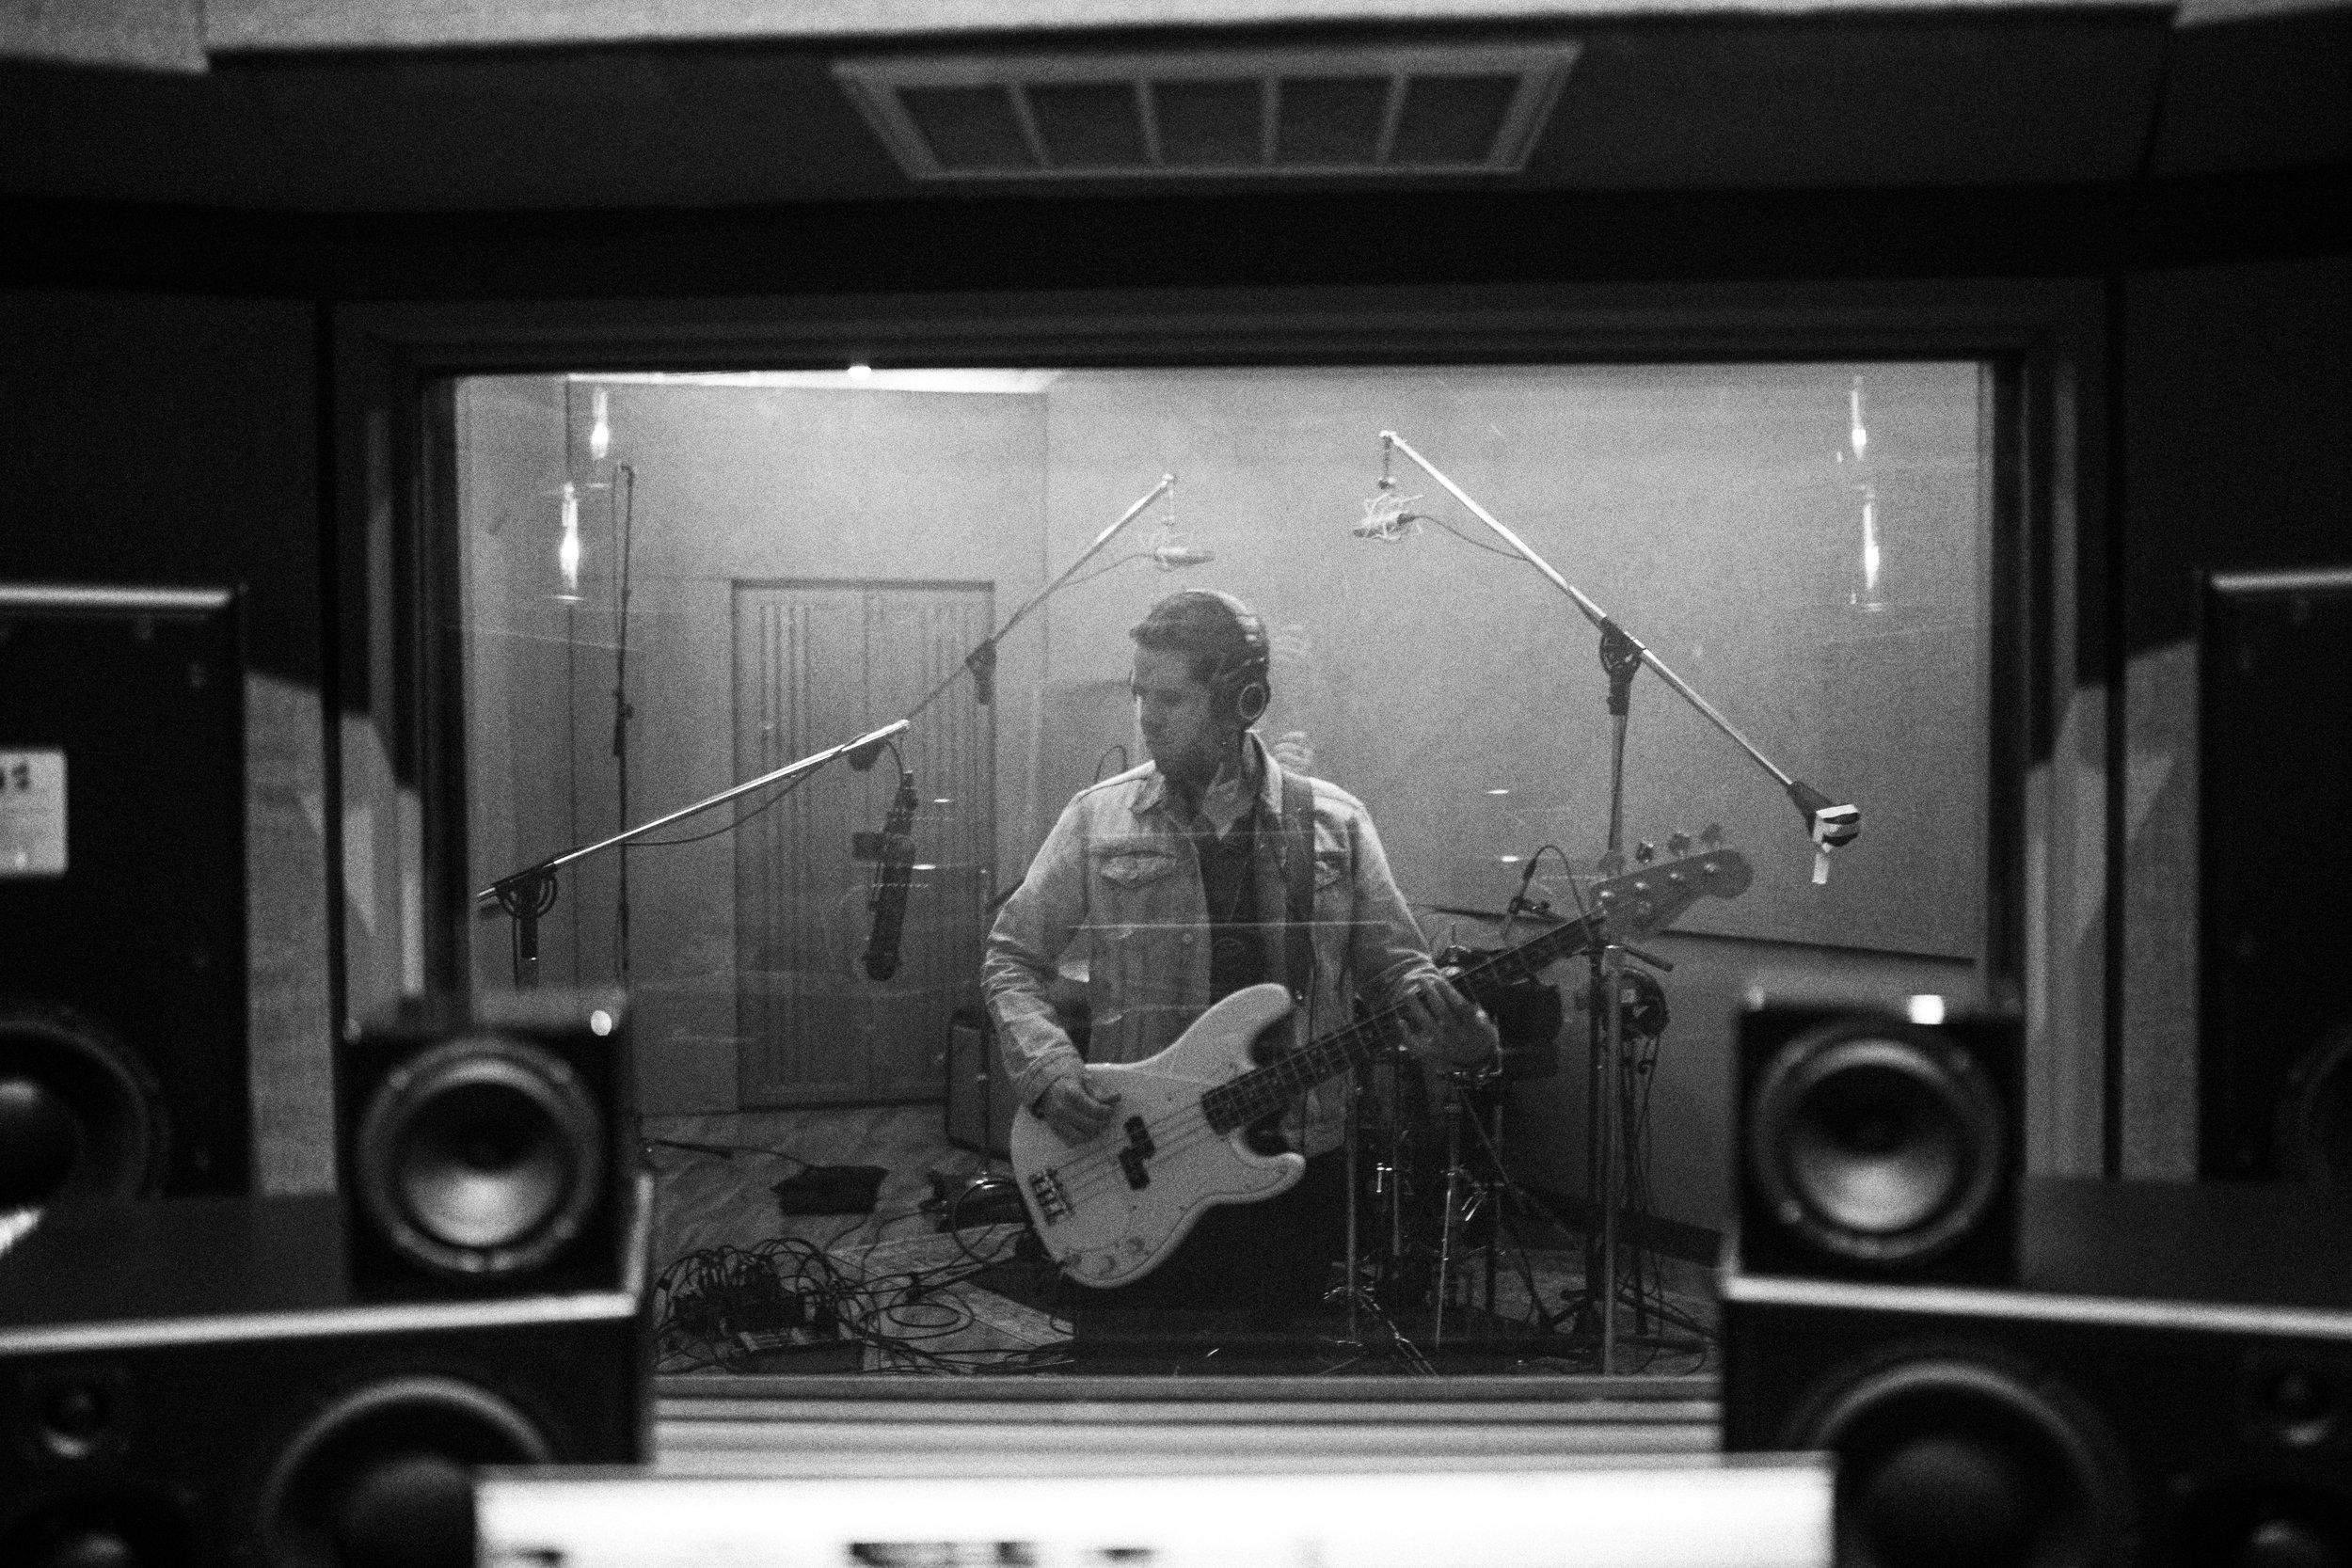 studio52.jpg